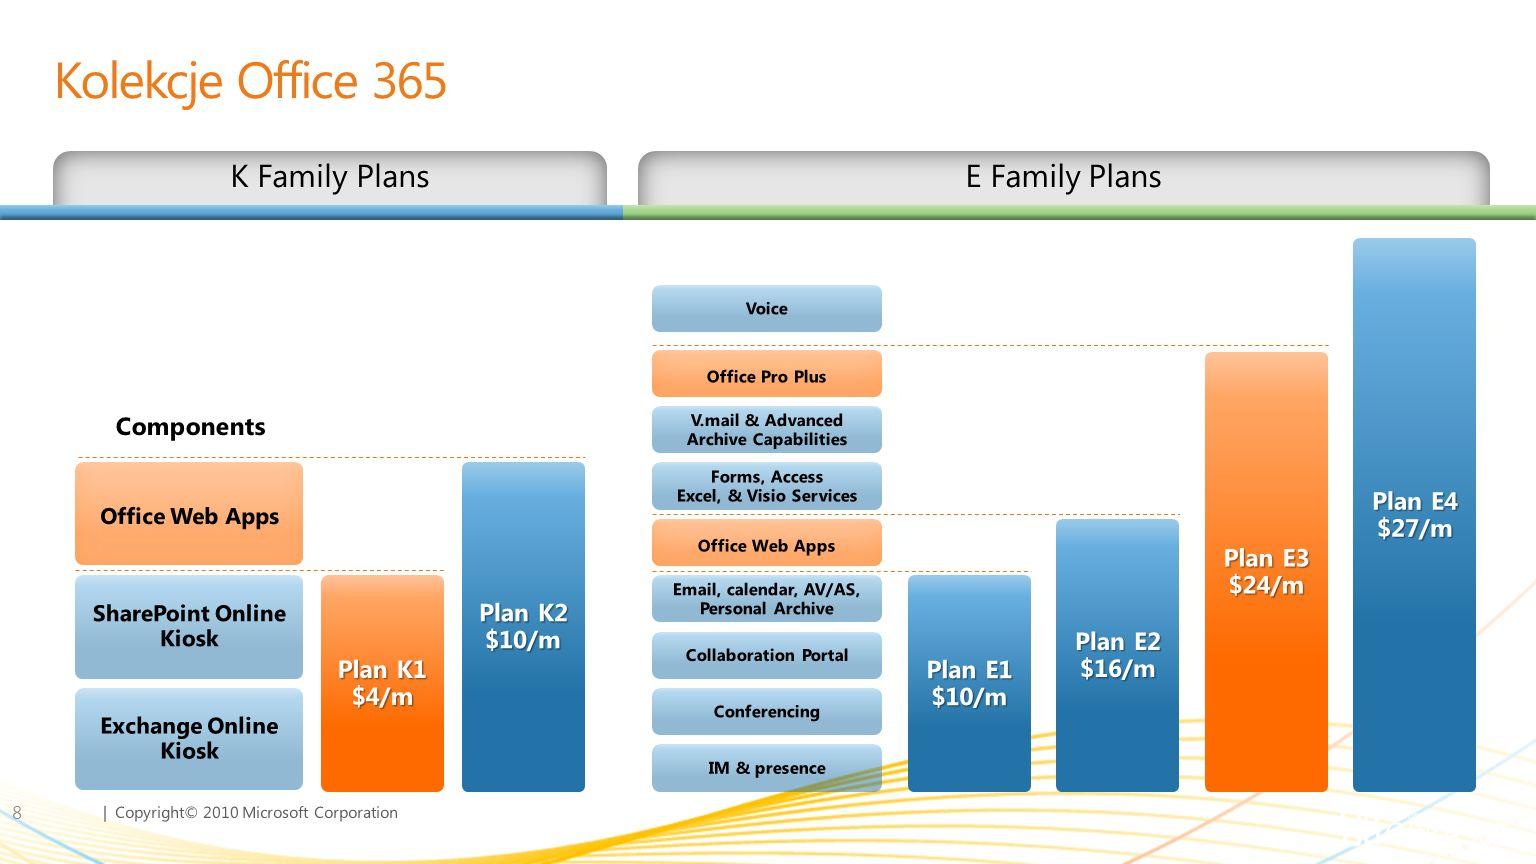 Kolekcje Office 365 K Family Plans E Family Plans Plan E1 $10/m